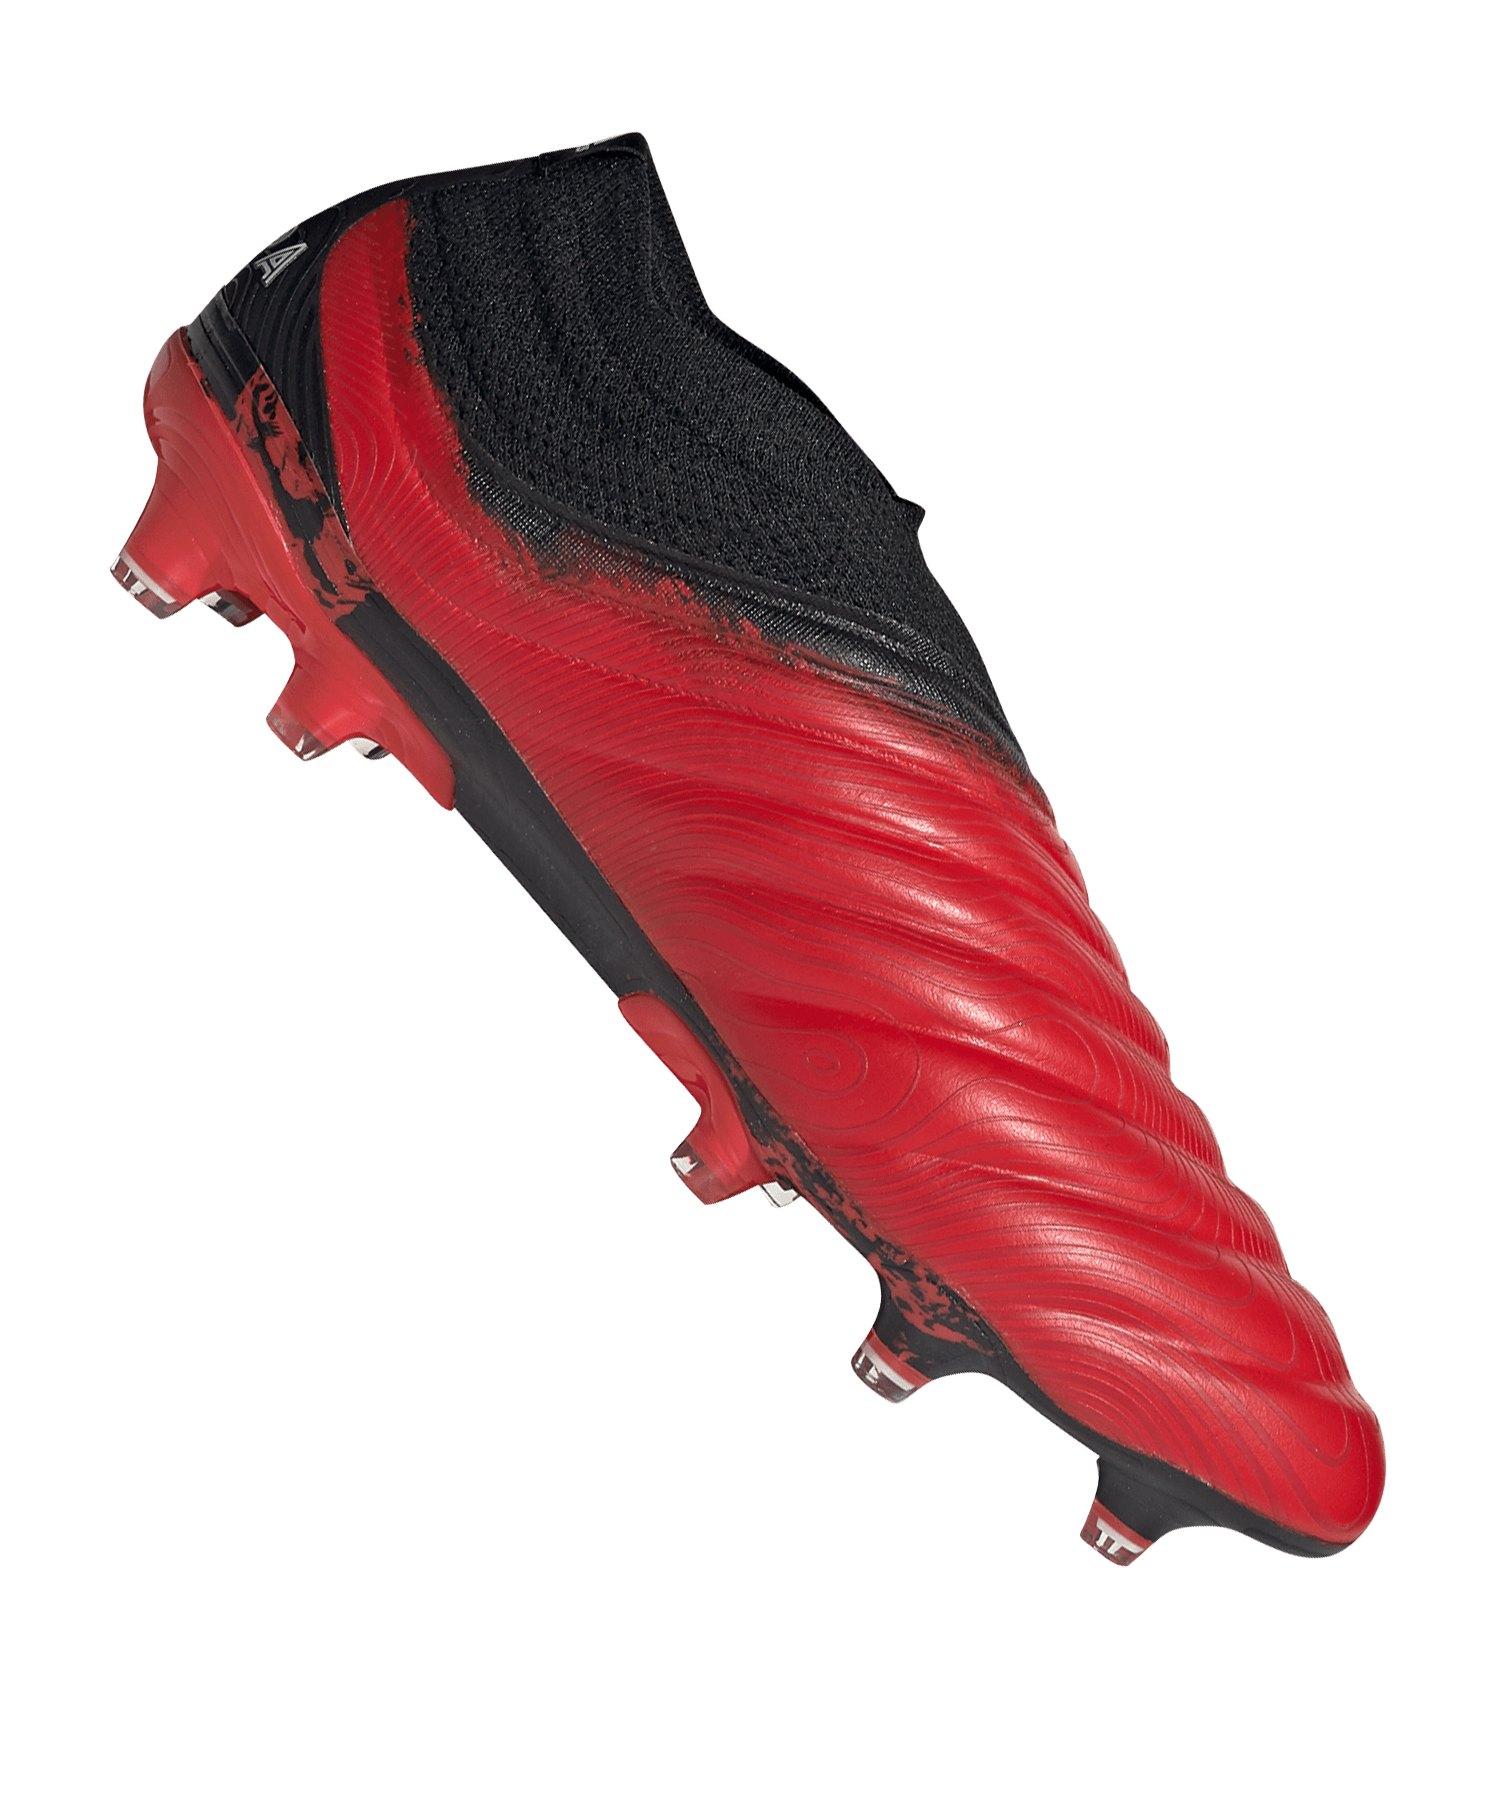 adidas COPA 20+ FG Rot Schwarz - rot